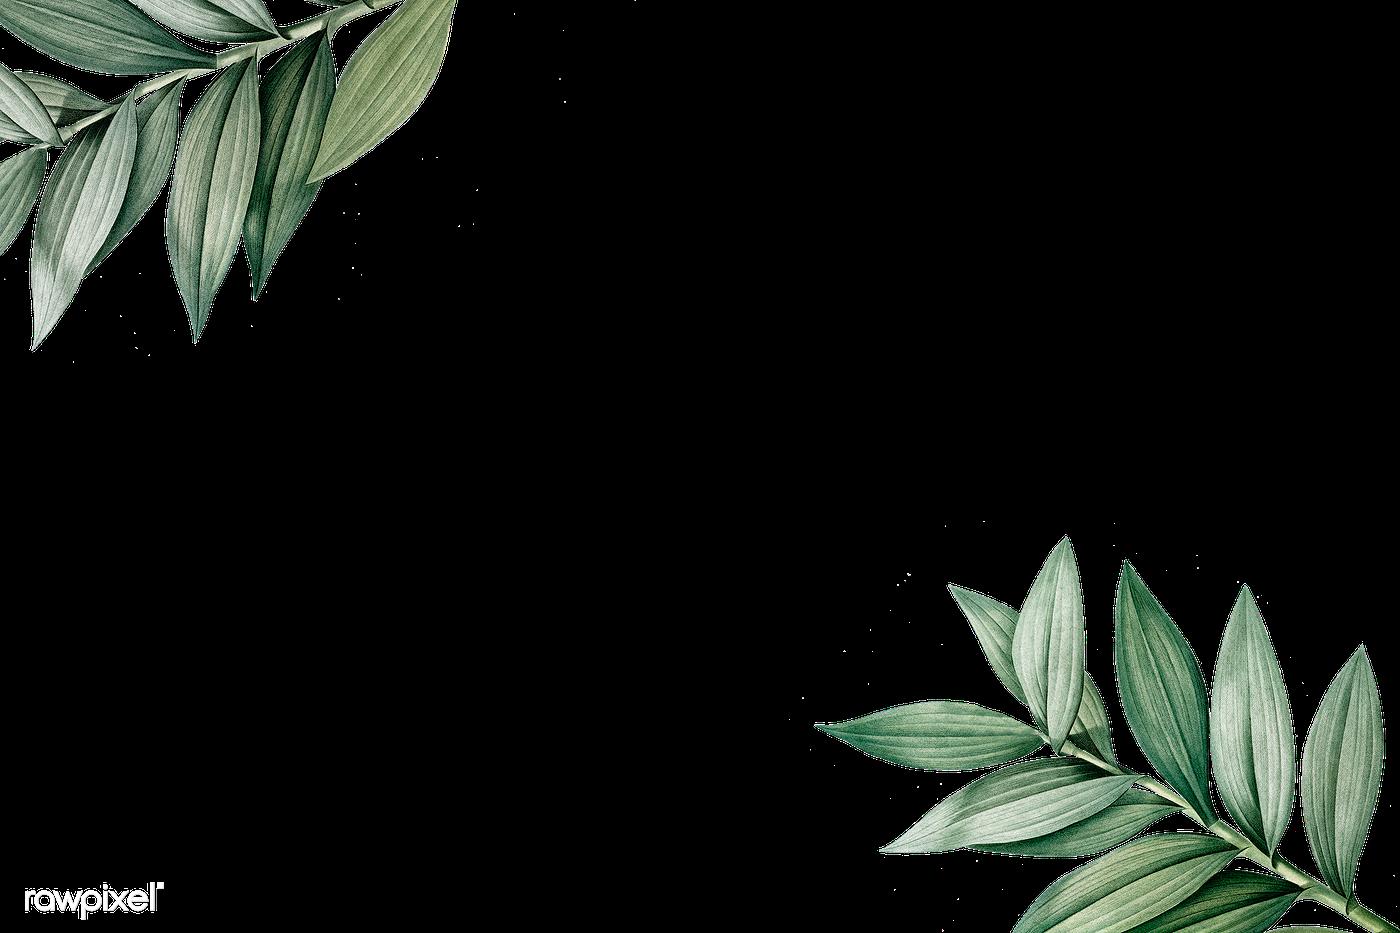 Google Image Result For Https Img Rawpixel Com S3fs Private Rawpixel Image In 2020 Desktop Wallpaper Art Computer Wallpaper Desktop Wallpapers Cute Desktop Wallpaper